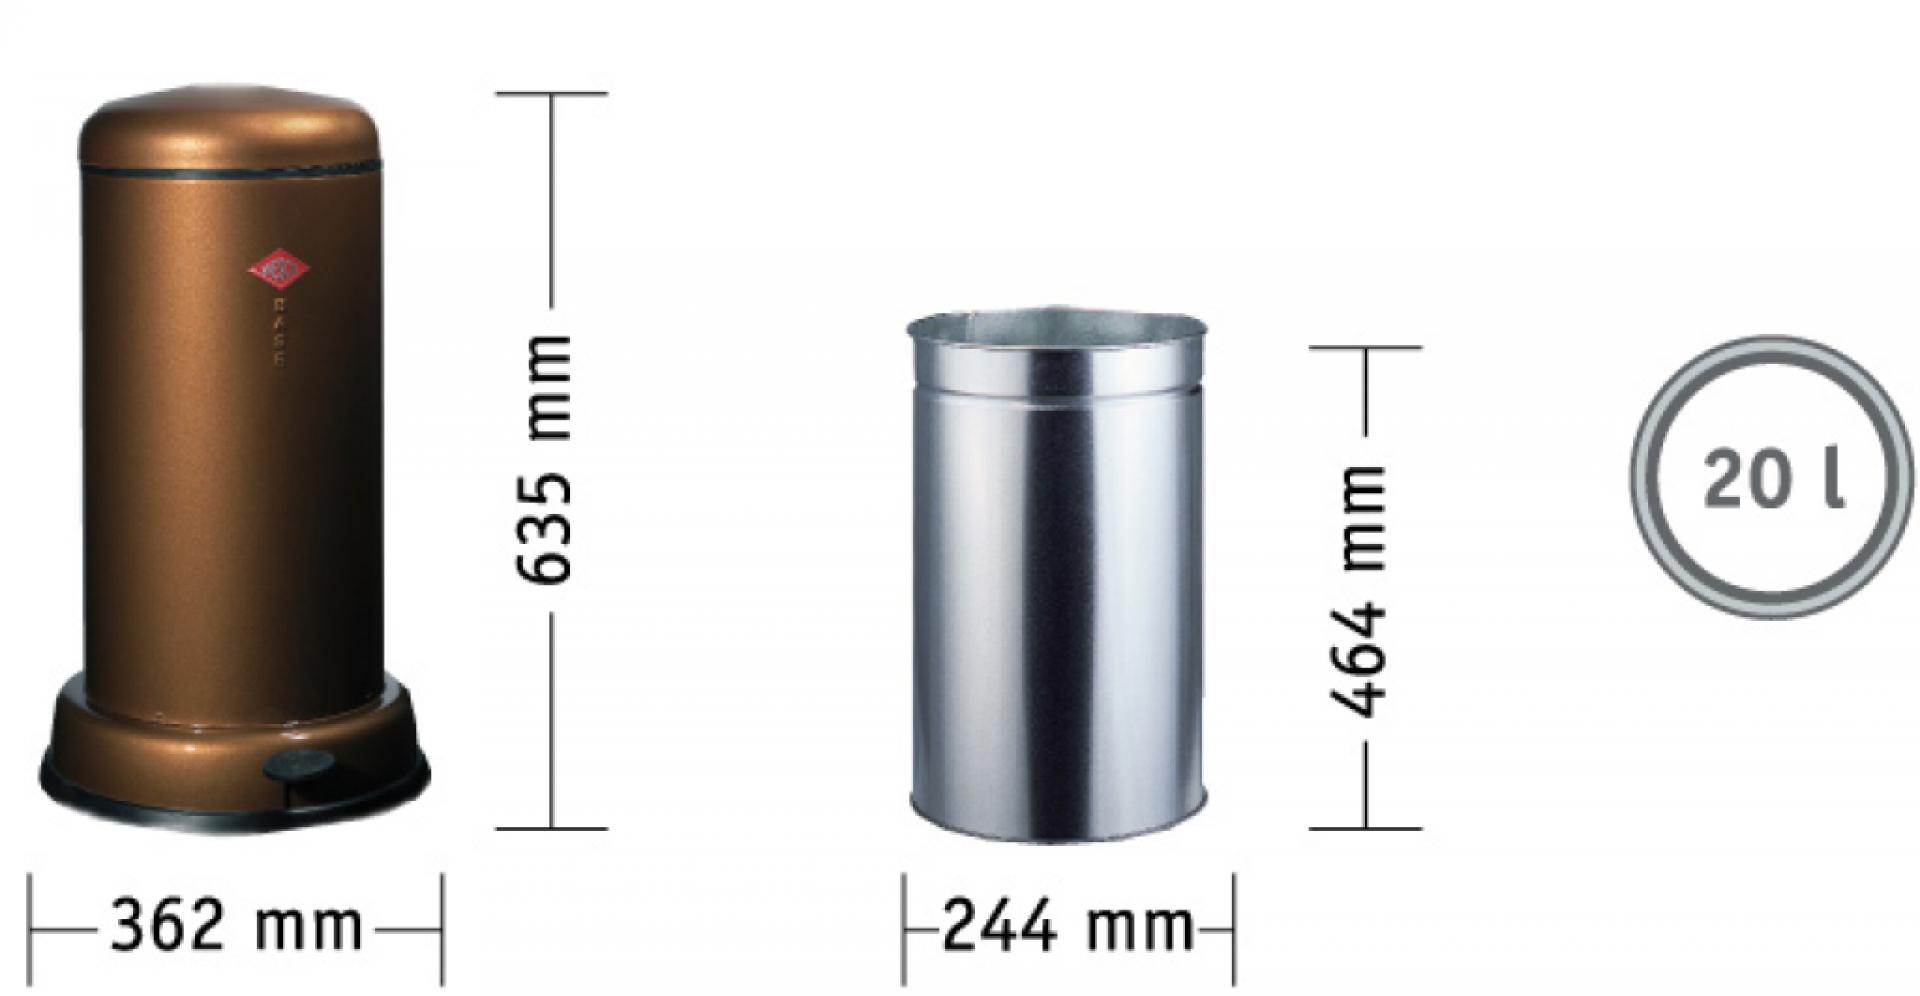 Baseboy 20 Liter Abfallsammler Wesco